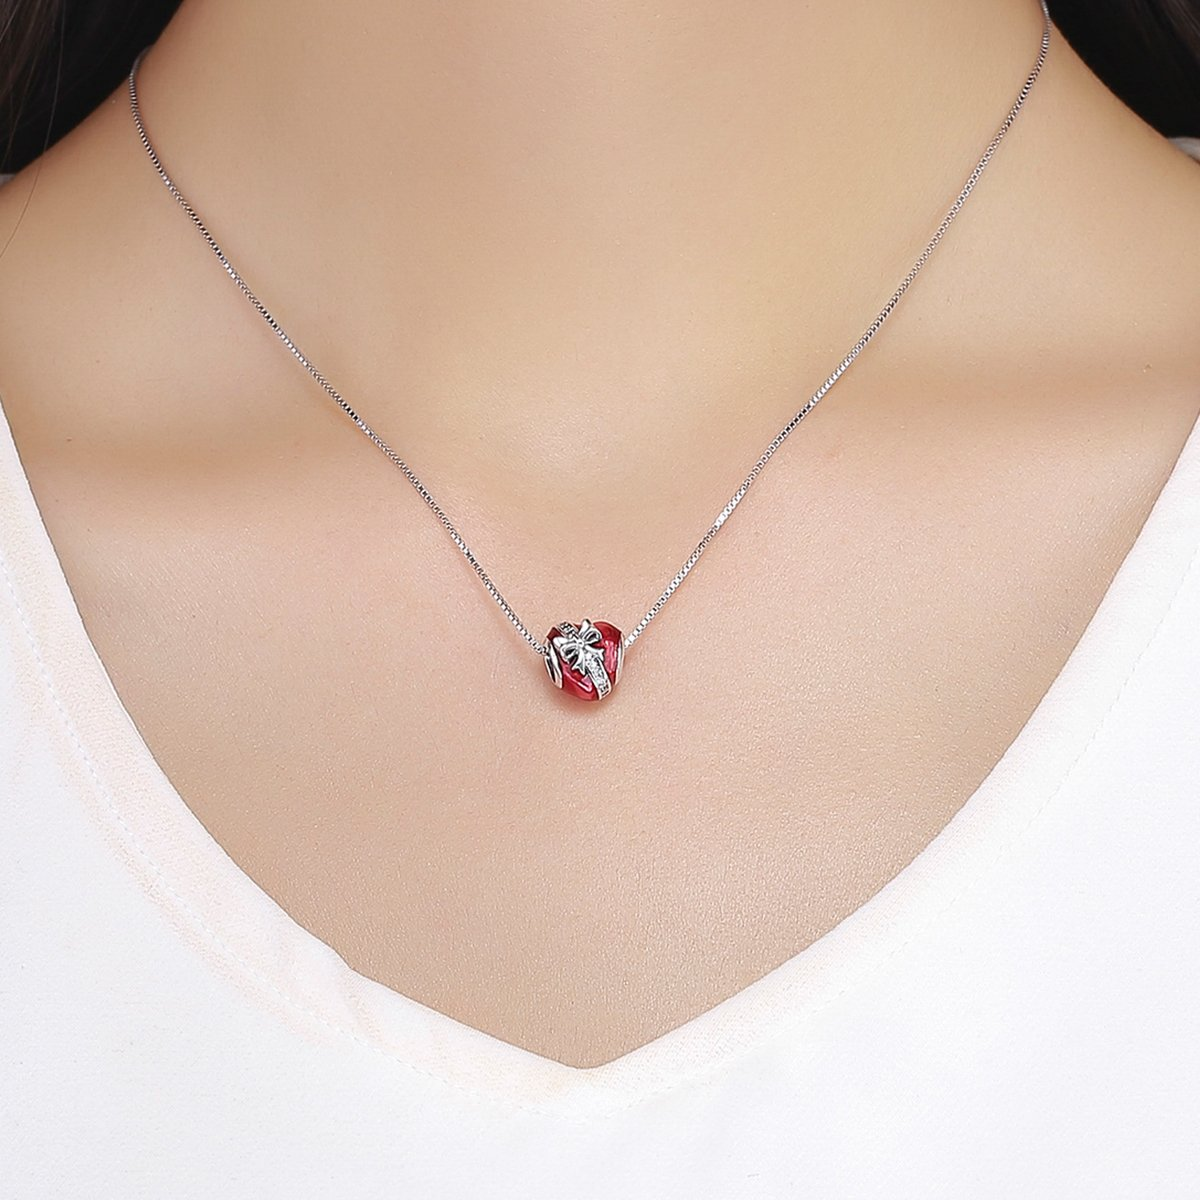 BAMOER 925 Sterling Silver Heart Charm Beads Heartbeat Love Heart Shape Charm Fit Bracelet Necklace for Her